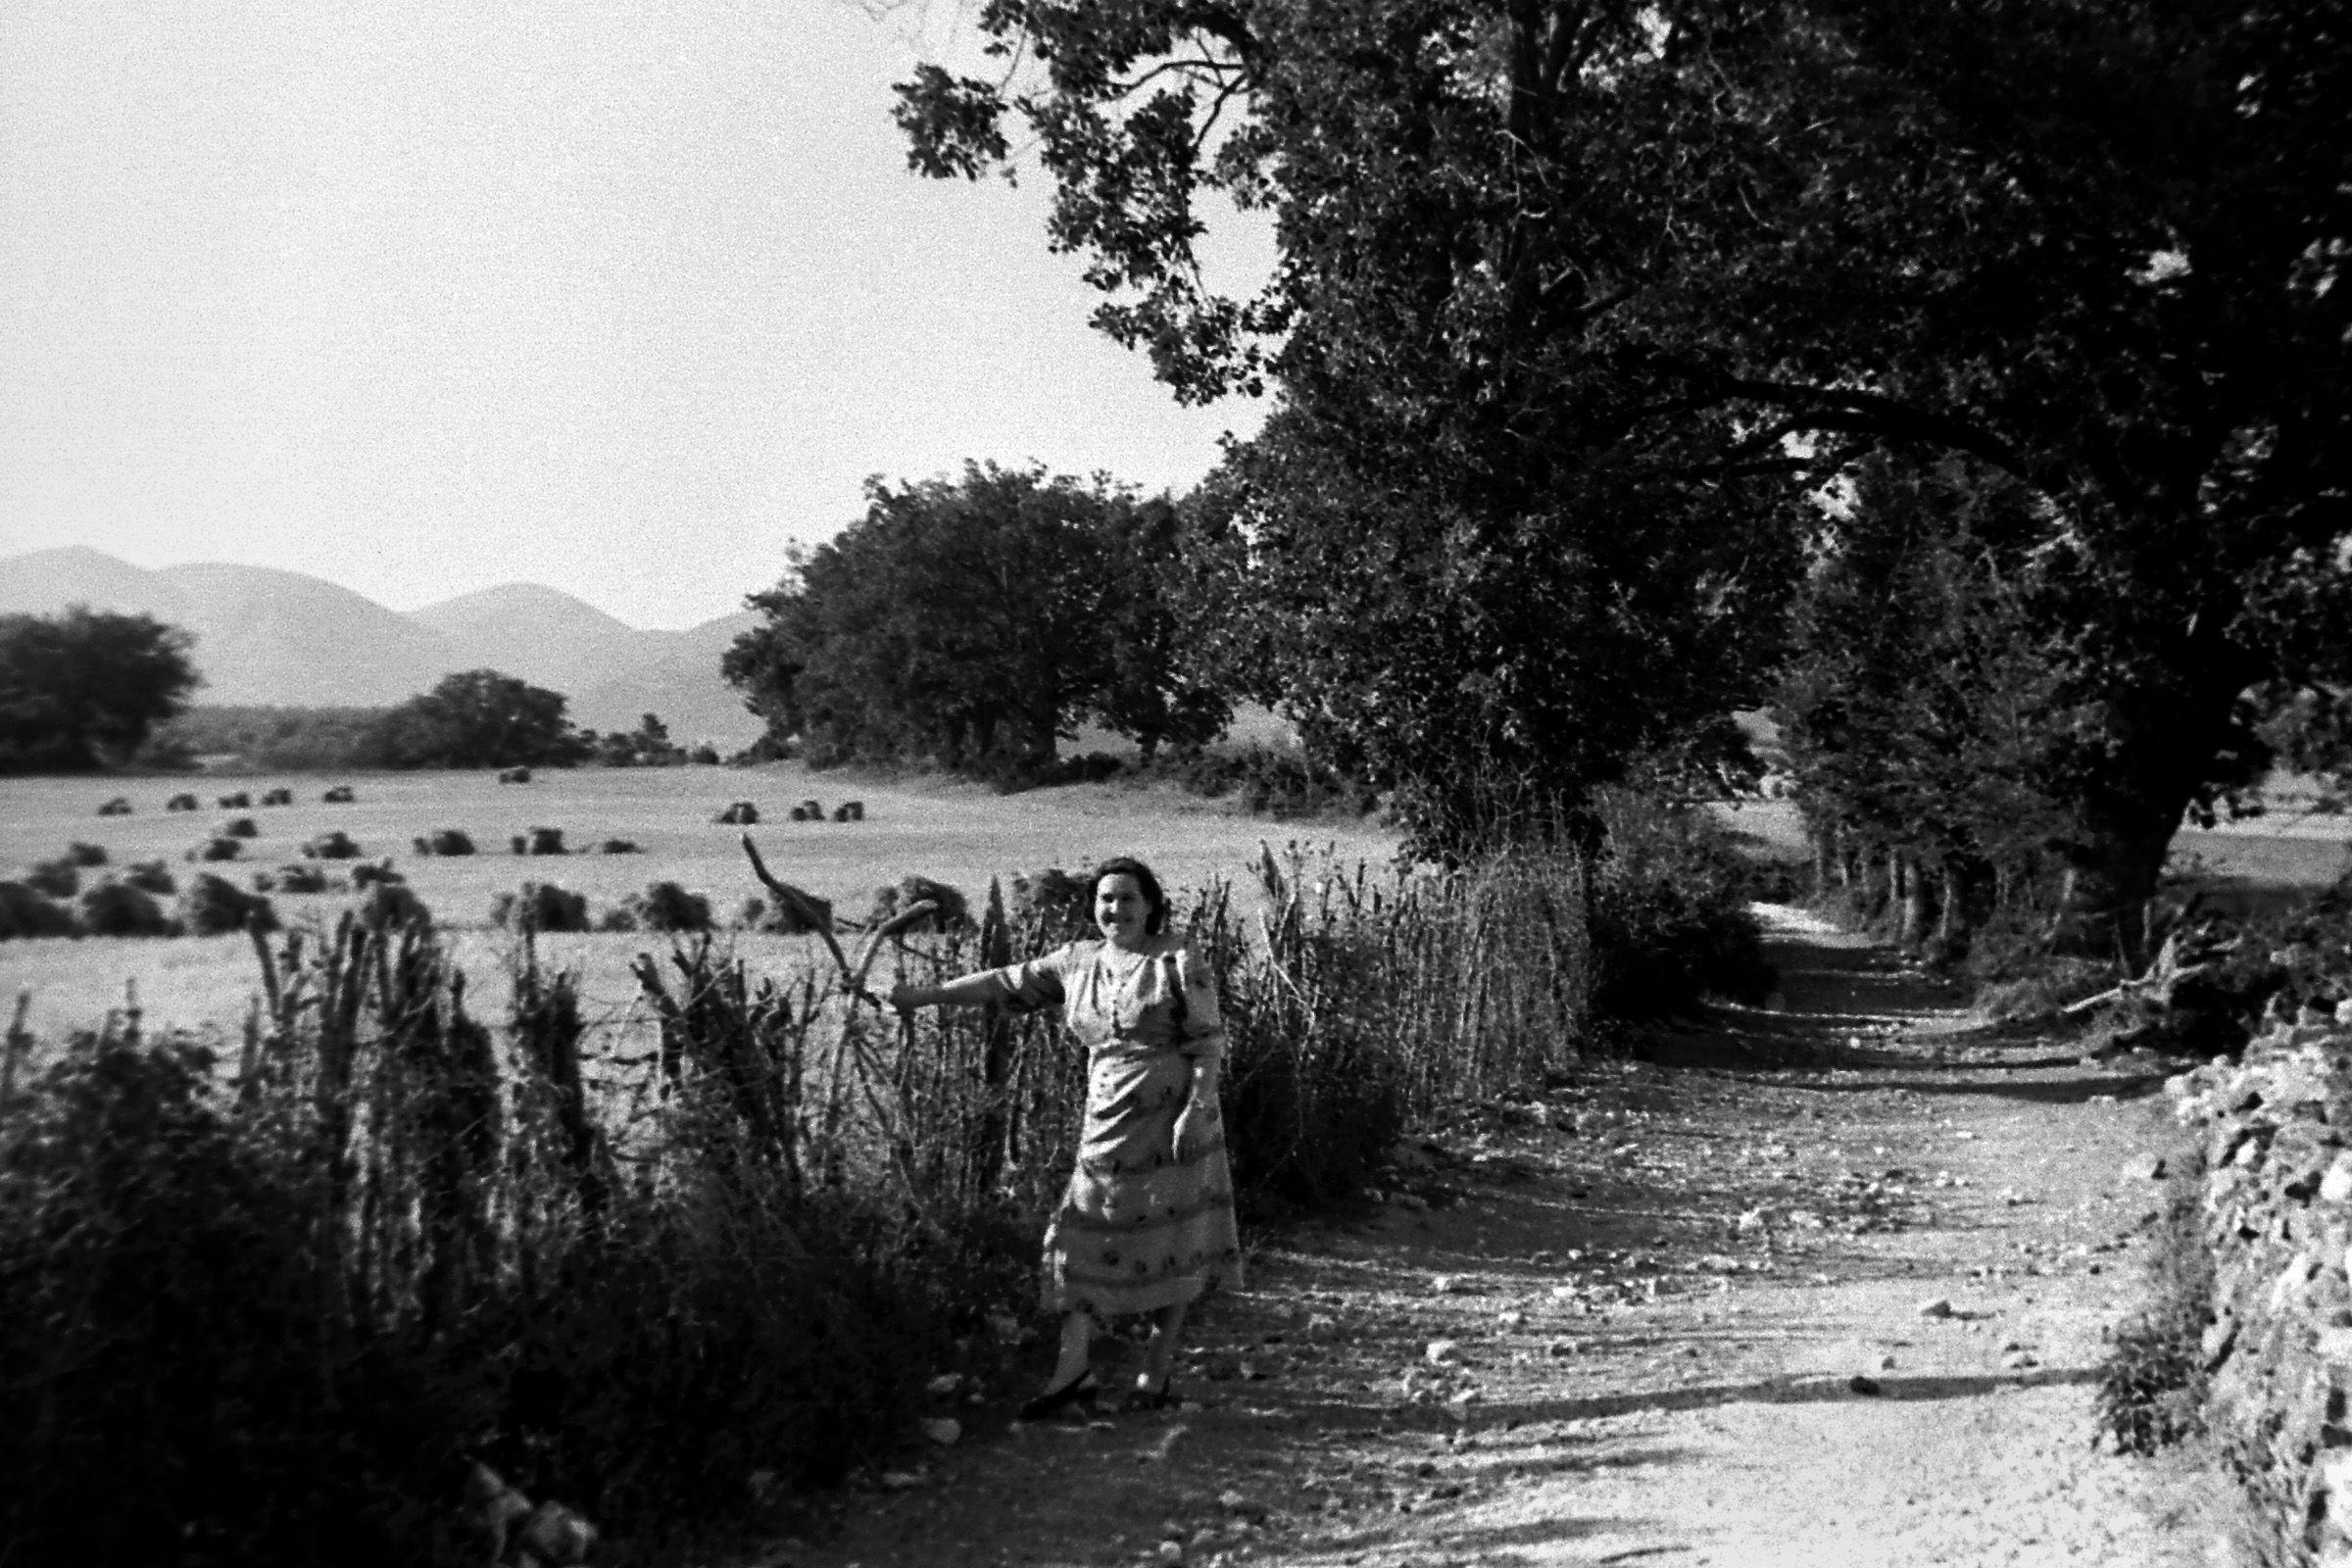 San giorgio di cascia anni 60 una strada di campagna for Piccole capanne di campagna